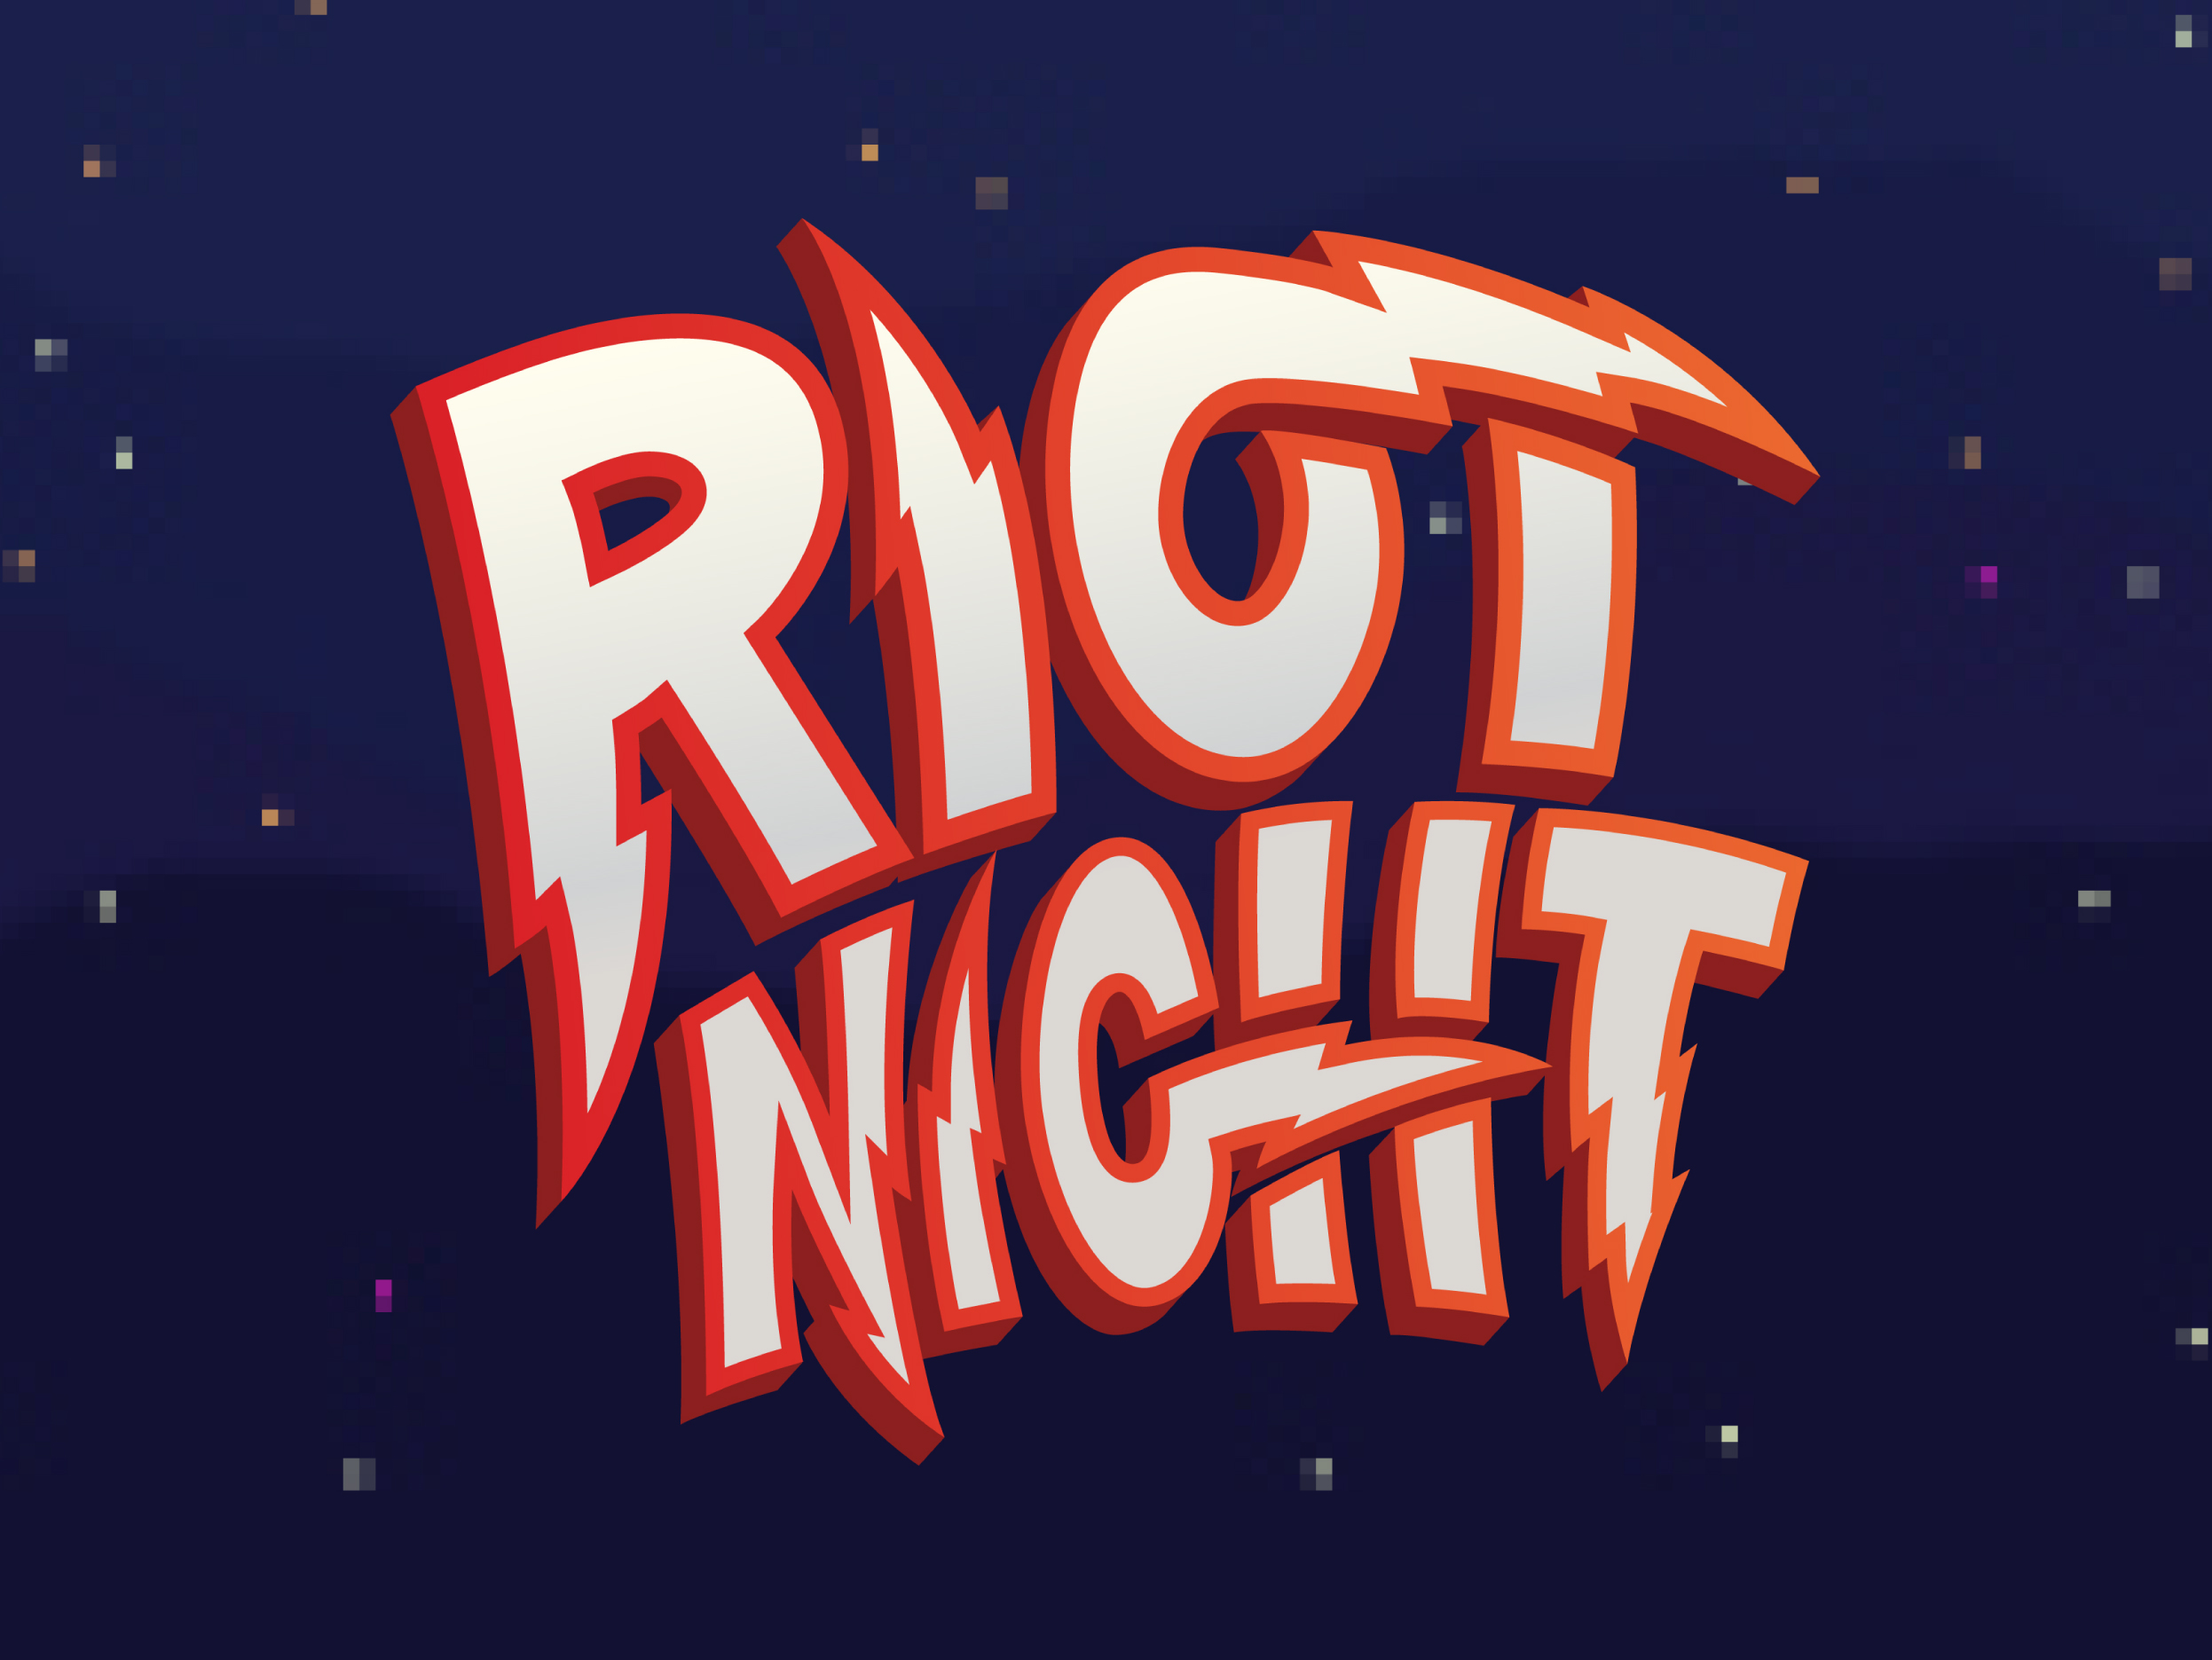 RiotNight_Branding_Hero-11.jpg